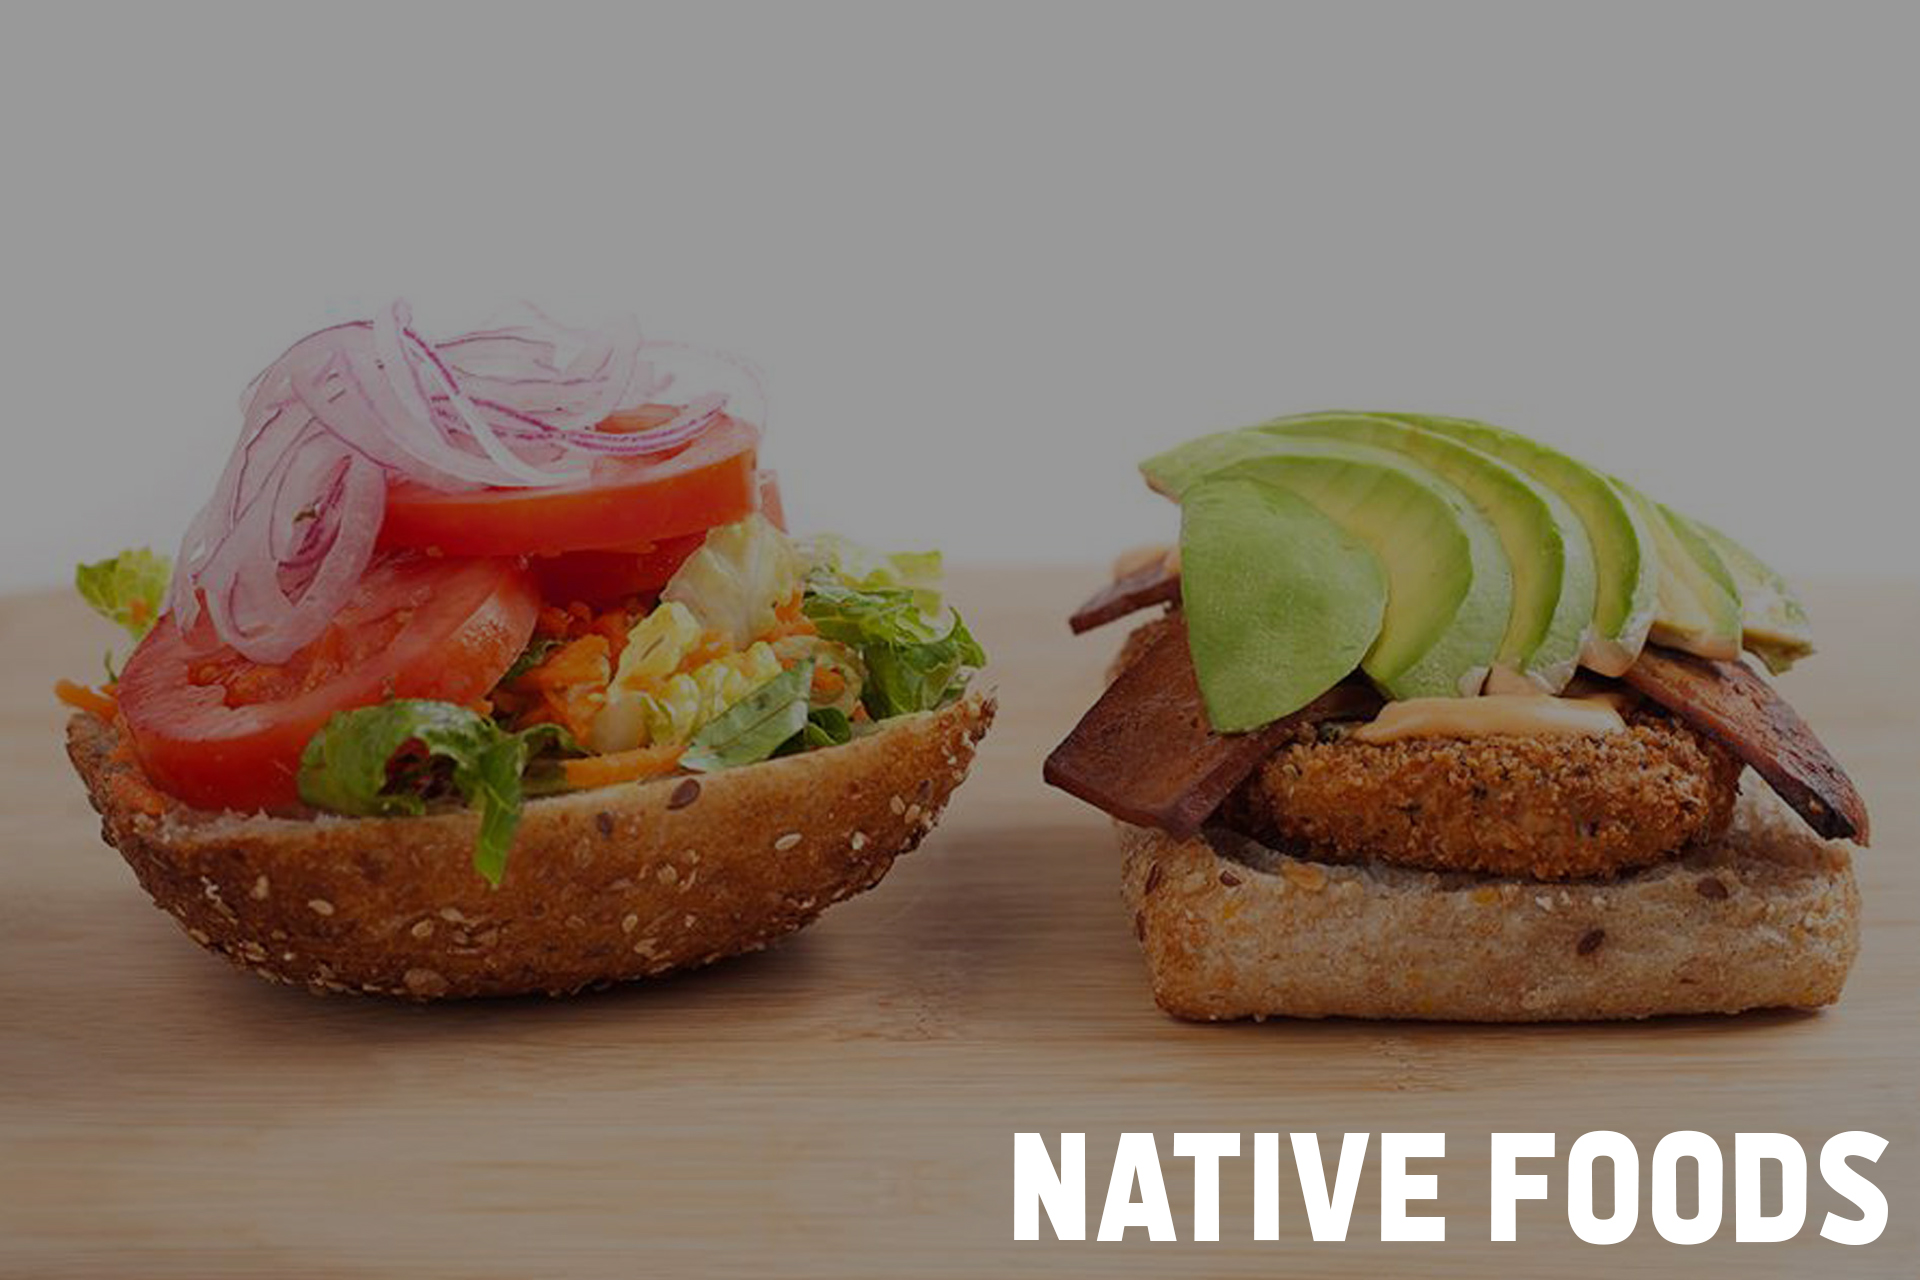 nativefoods-INTRO.jpg